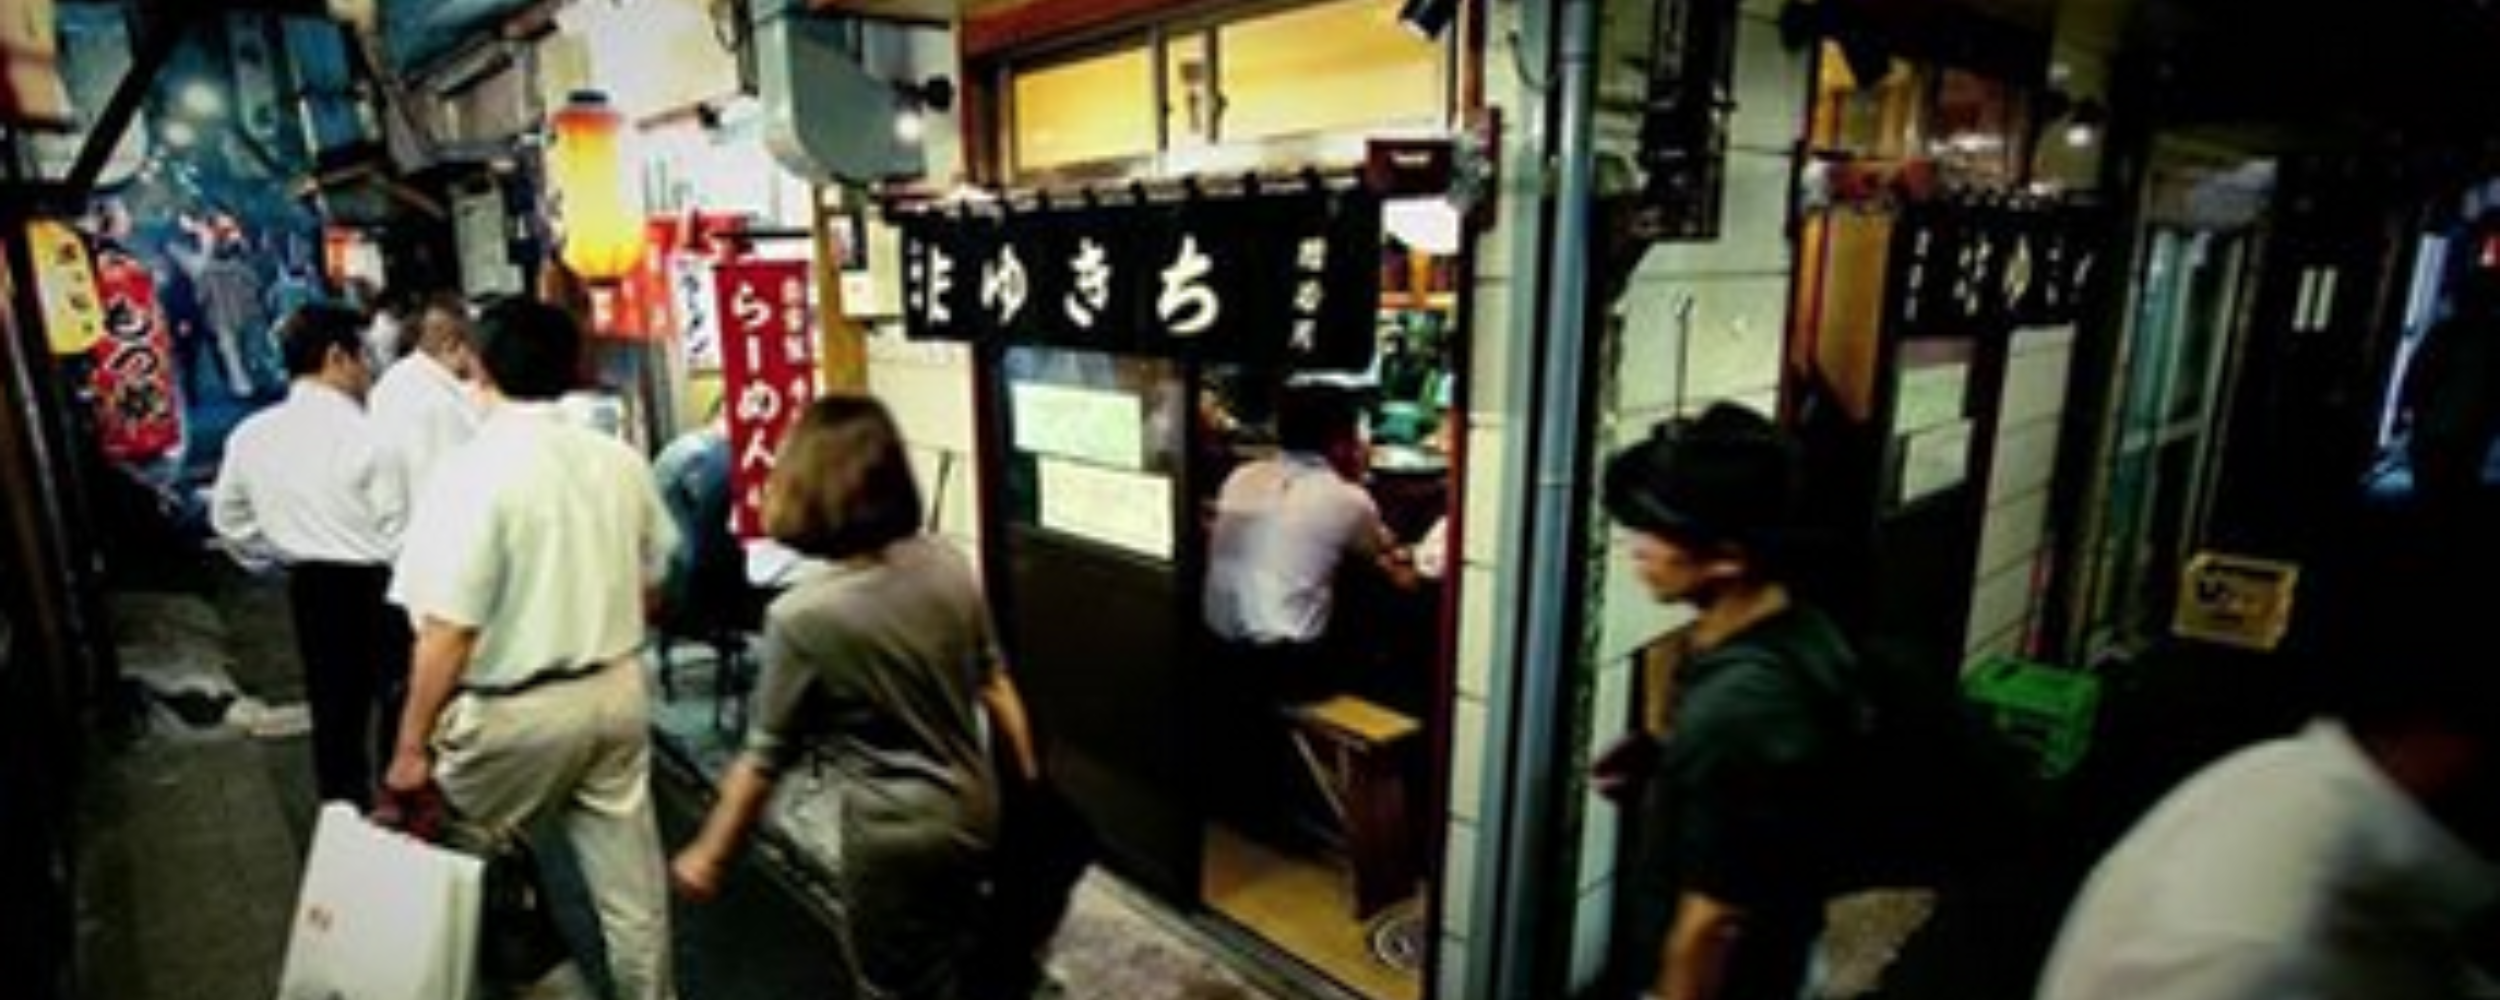 Japan Open Cafe